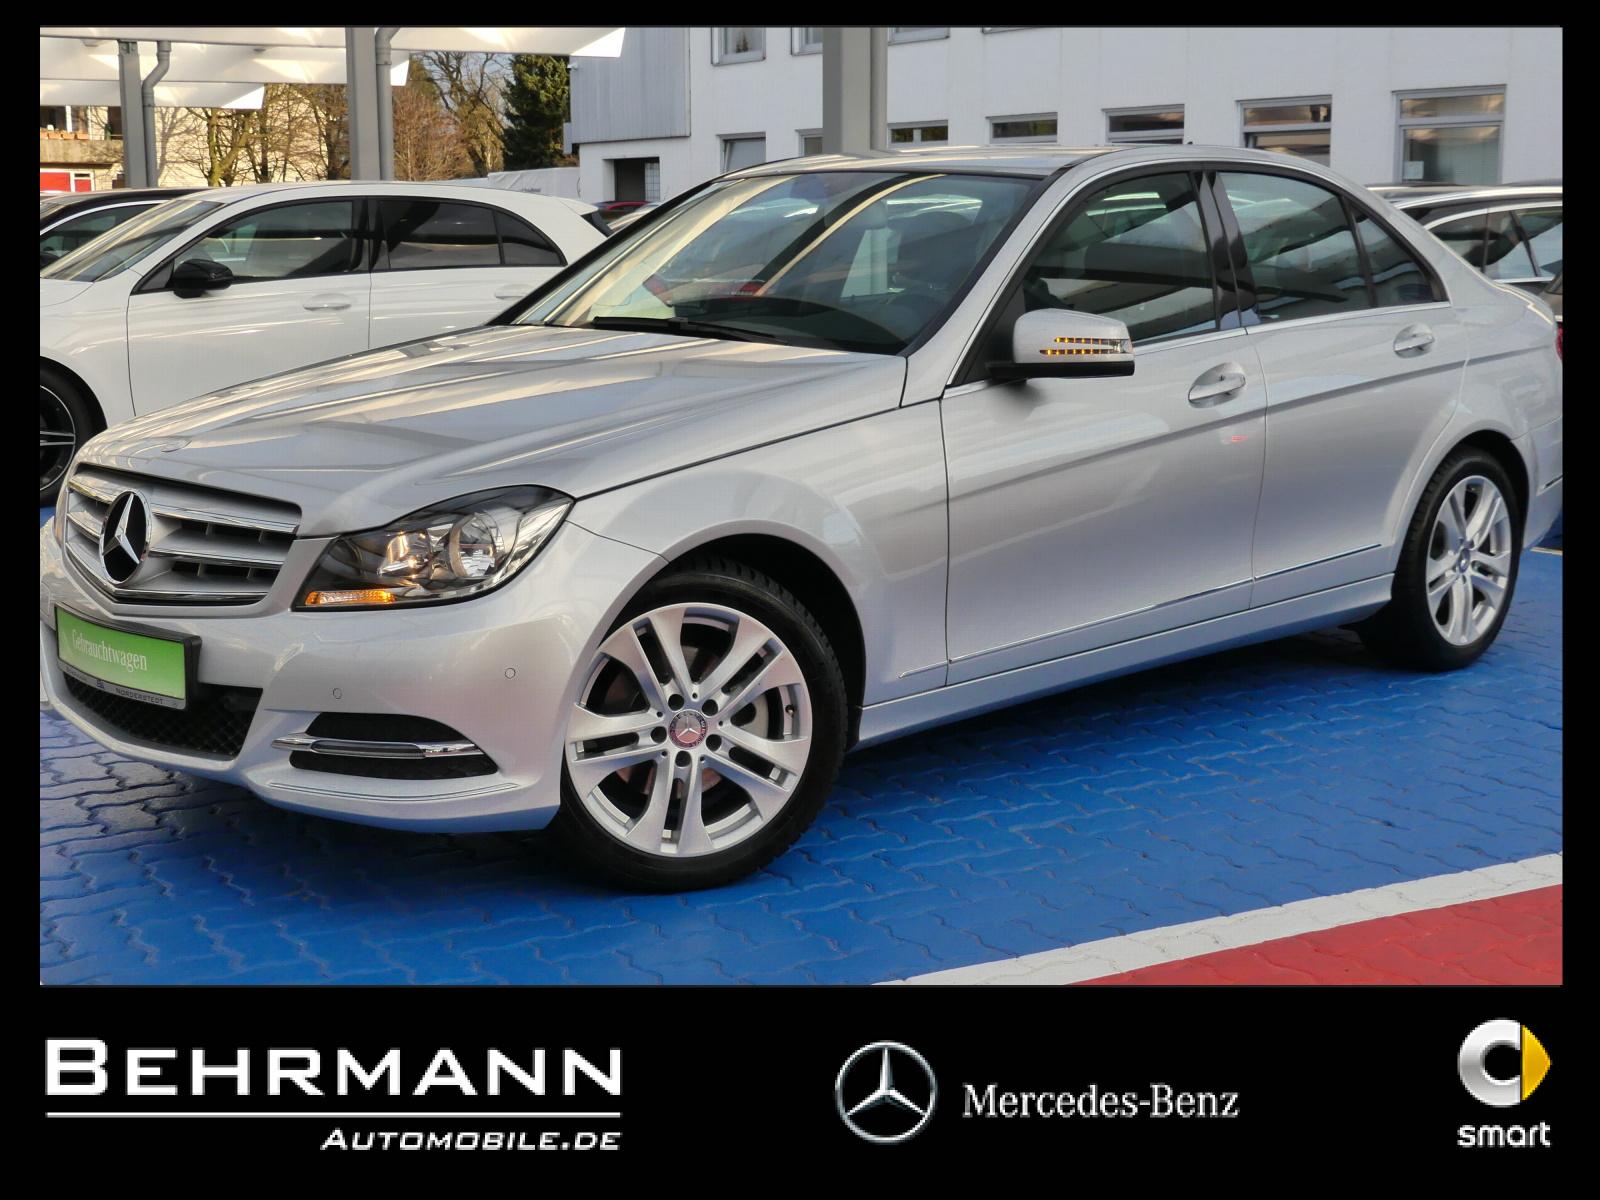 Mercedes-Benz C 220 CDI Avantgarde +Navi+Bluetooth+Parktronic+, Jahr 2013, Diesel